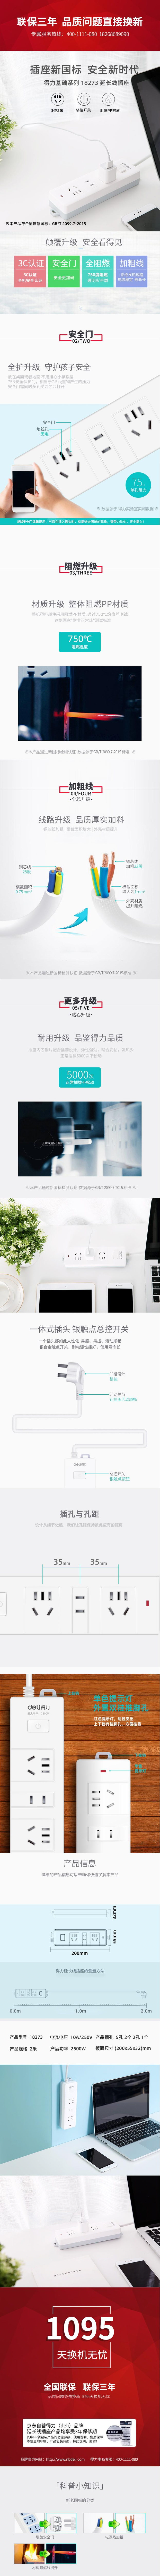 VWIN真人18273插座_2+1_2米_PVC袋装(白)(只)